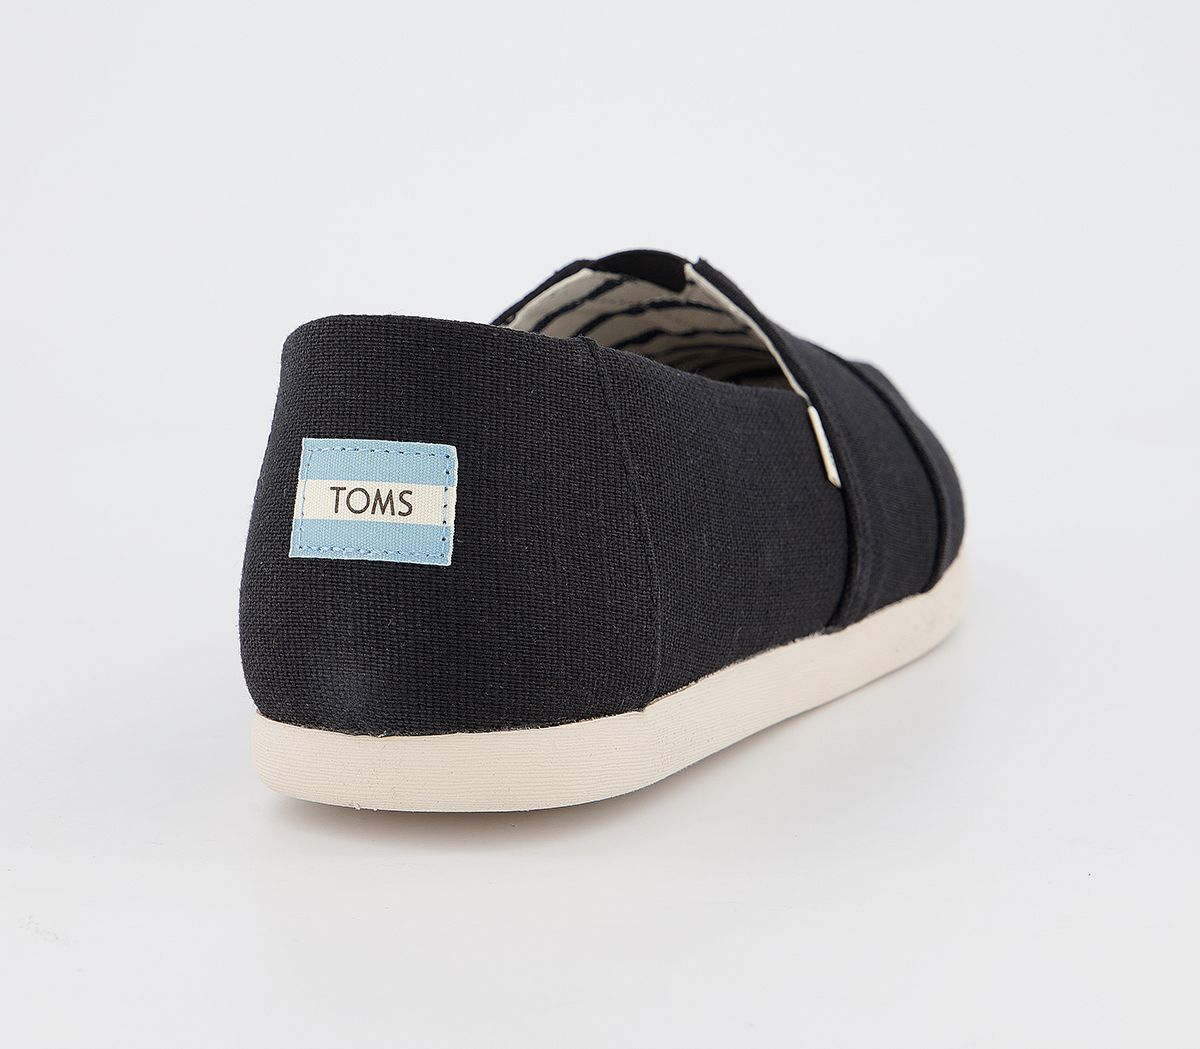 Da-Uomo-Toms-Toms-Classic-Alpargata-SLIP-ONS-BLACK-Heritage-Tela-Scarpe-Casual miniatura 4